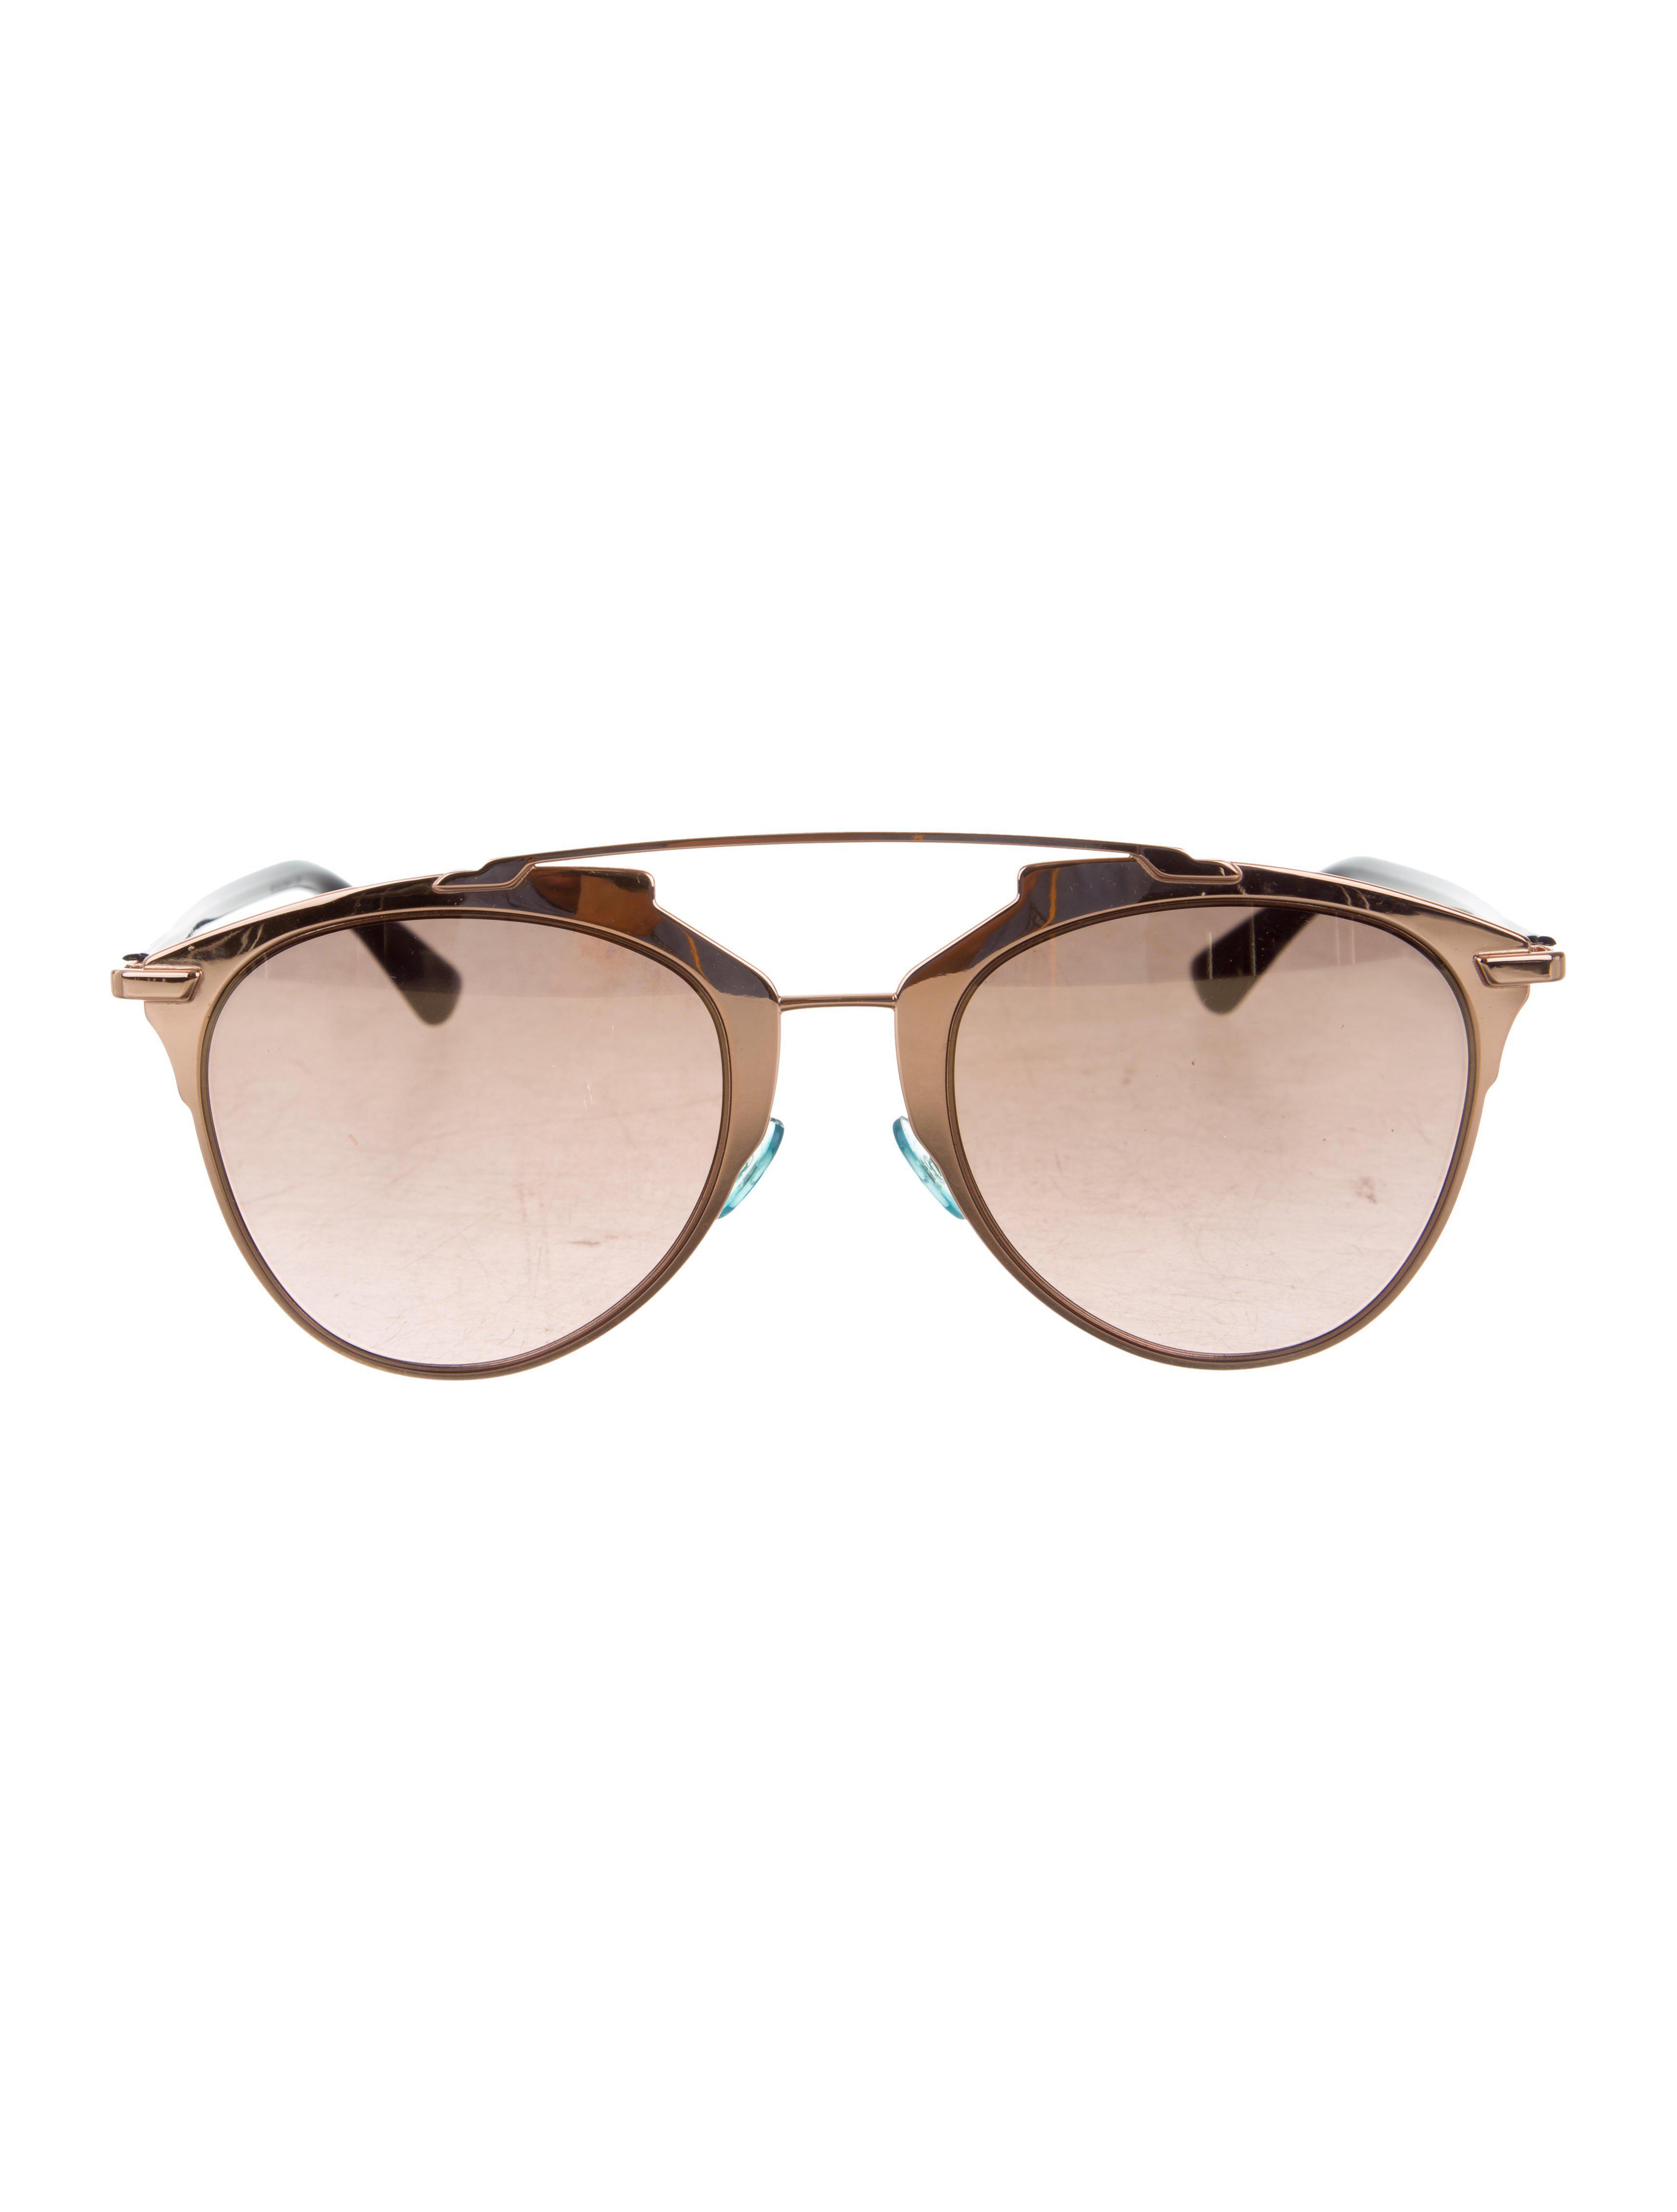 11511e6fc279c Lyst - Dior Reflected Mirrored Sunglasses Rose in Metallic